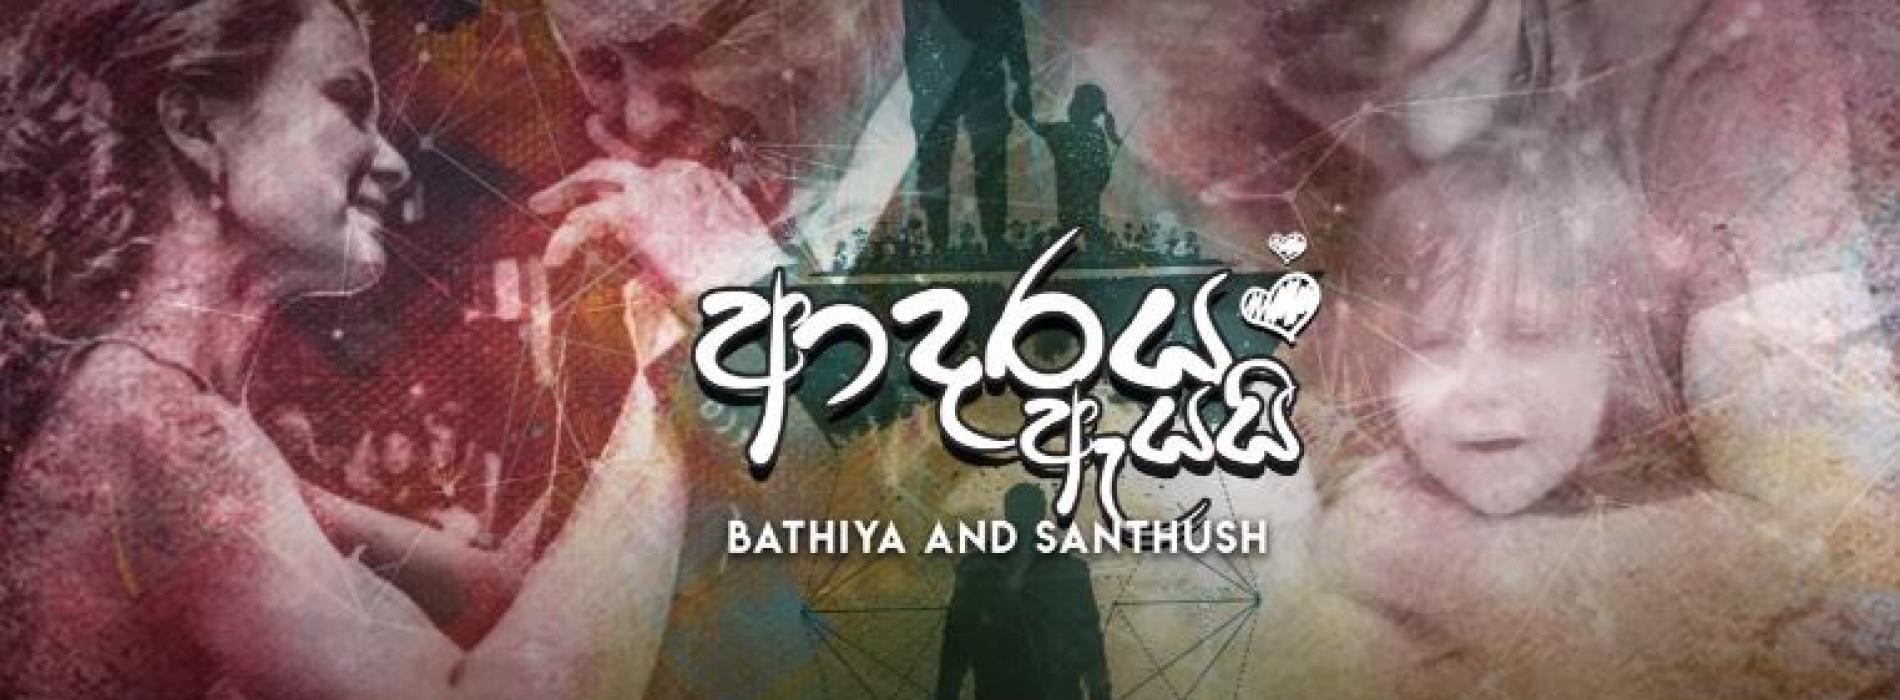 Adaraya Ayai – Official Lyric Video | Bathiya and Santhush